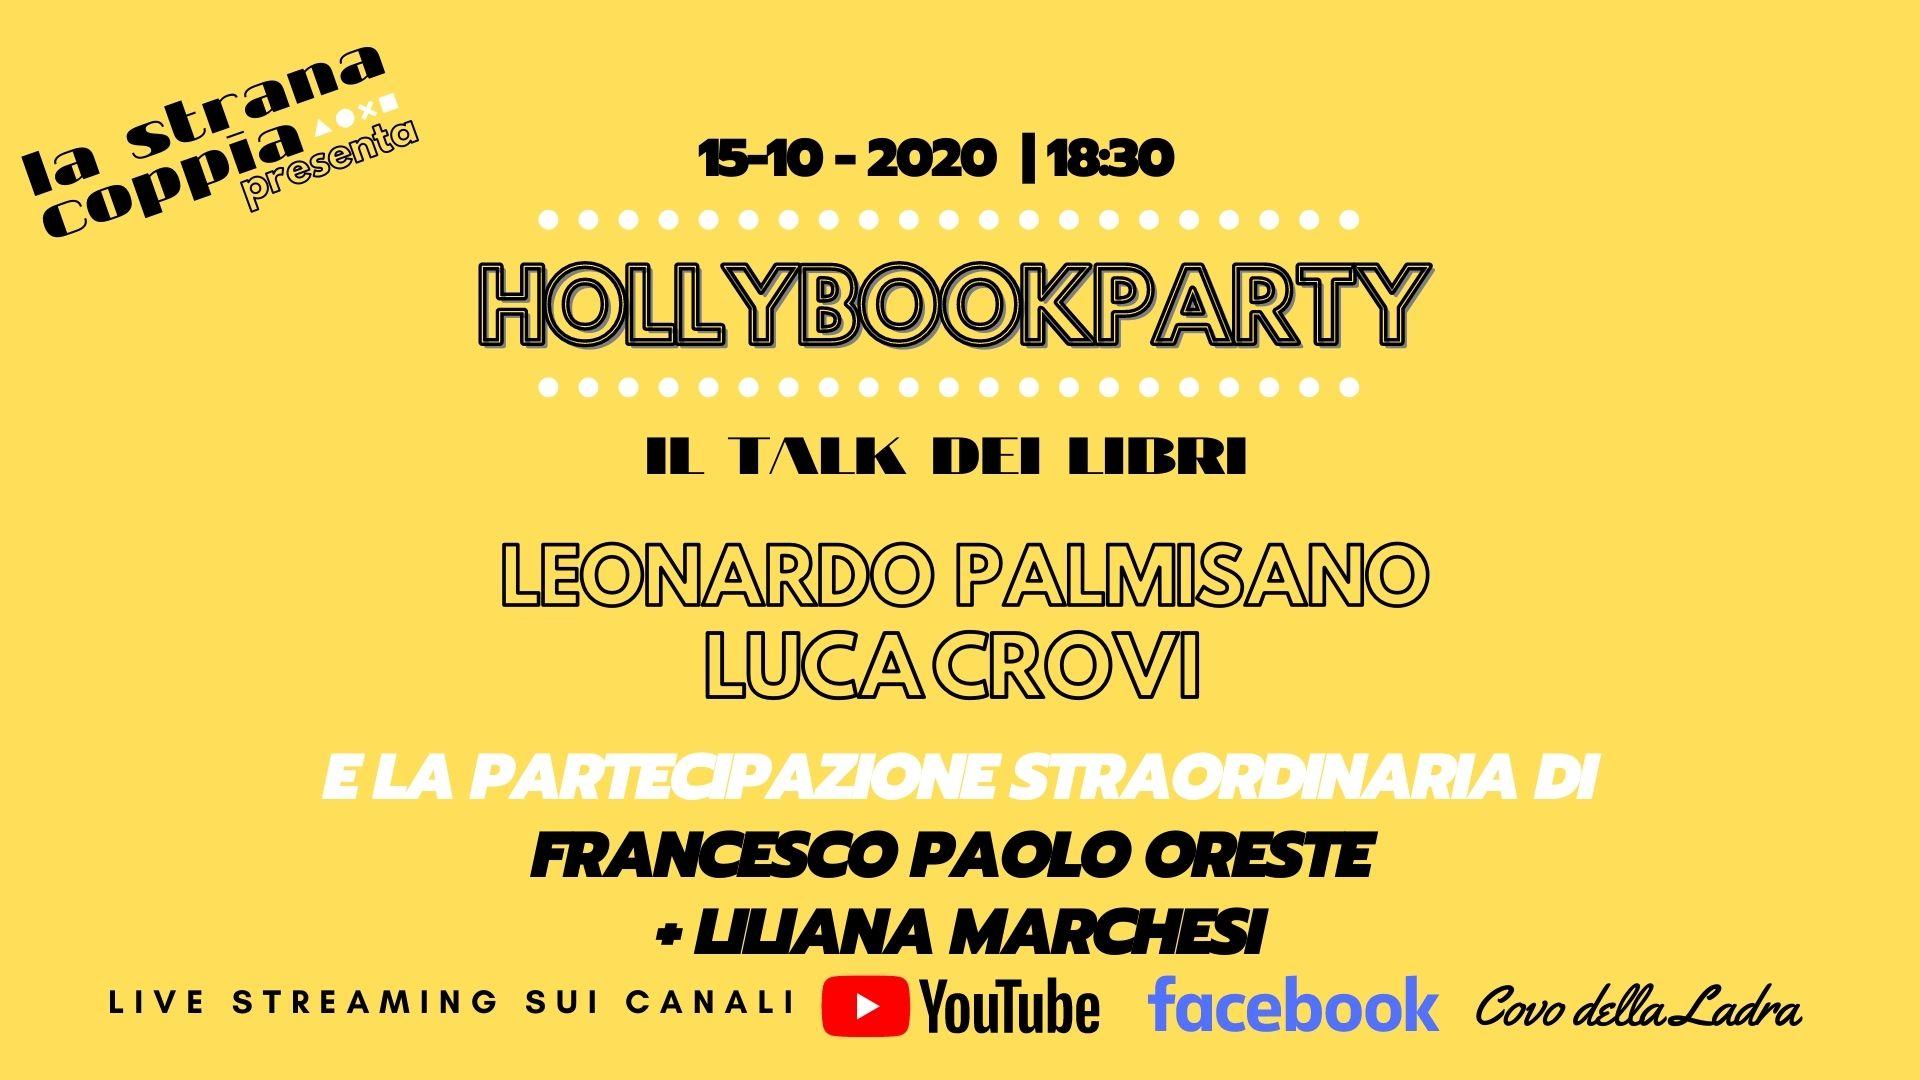 HollybookParty #2 – Leonardo Palmisano + Luca Crovi + Francesco Paolo Oreste + Liliana Marchesi